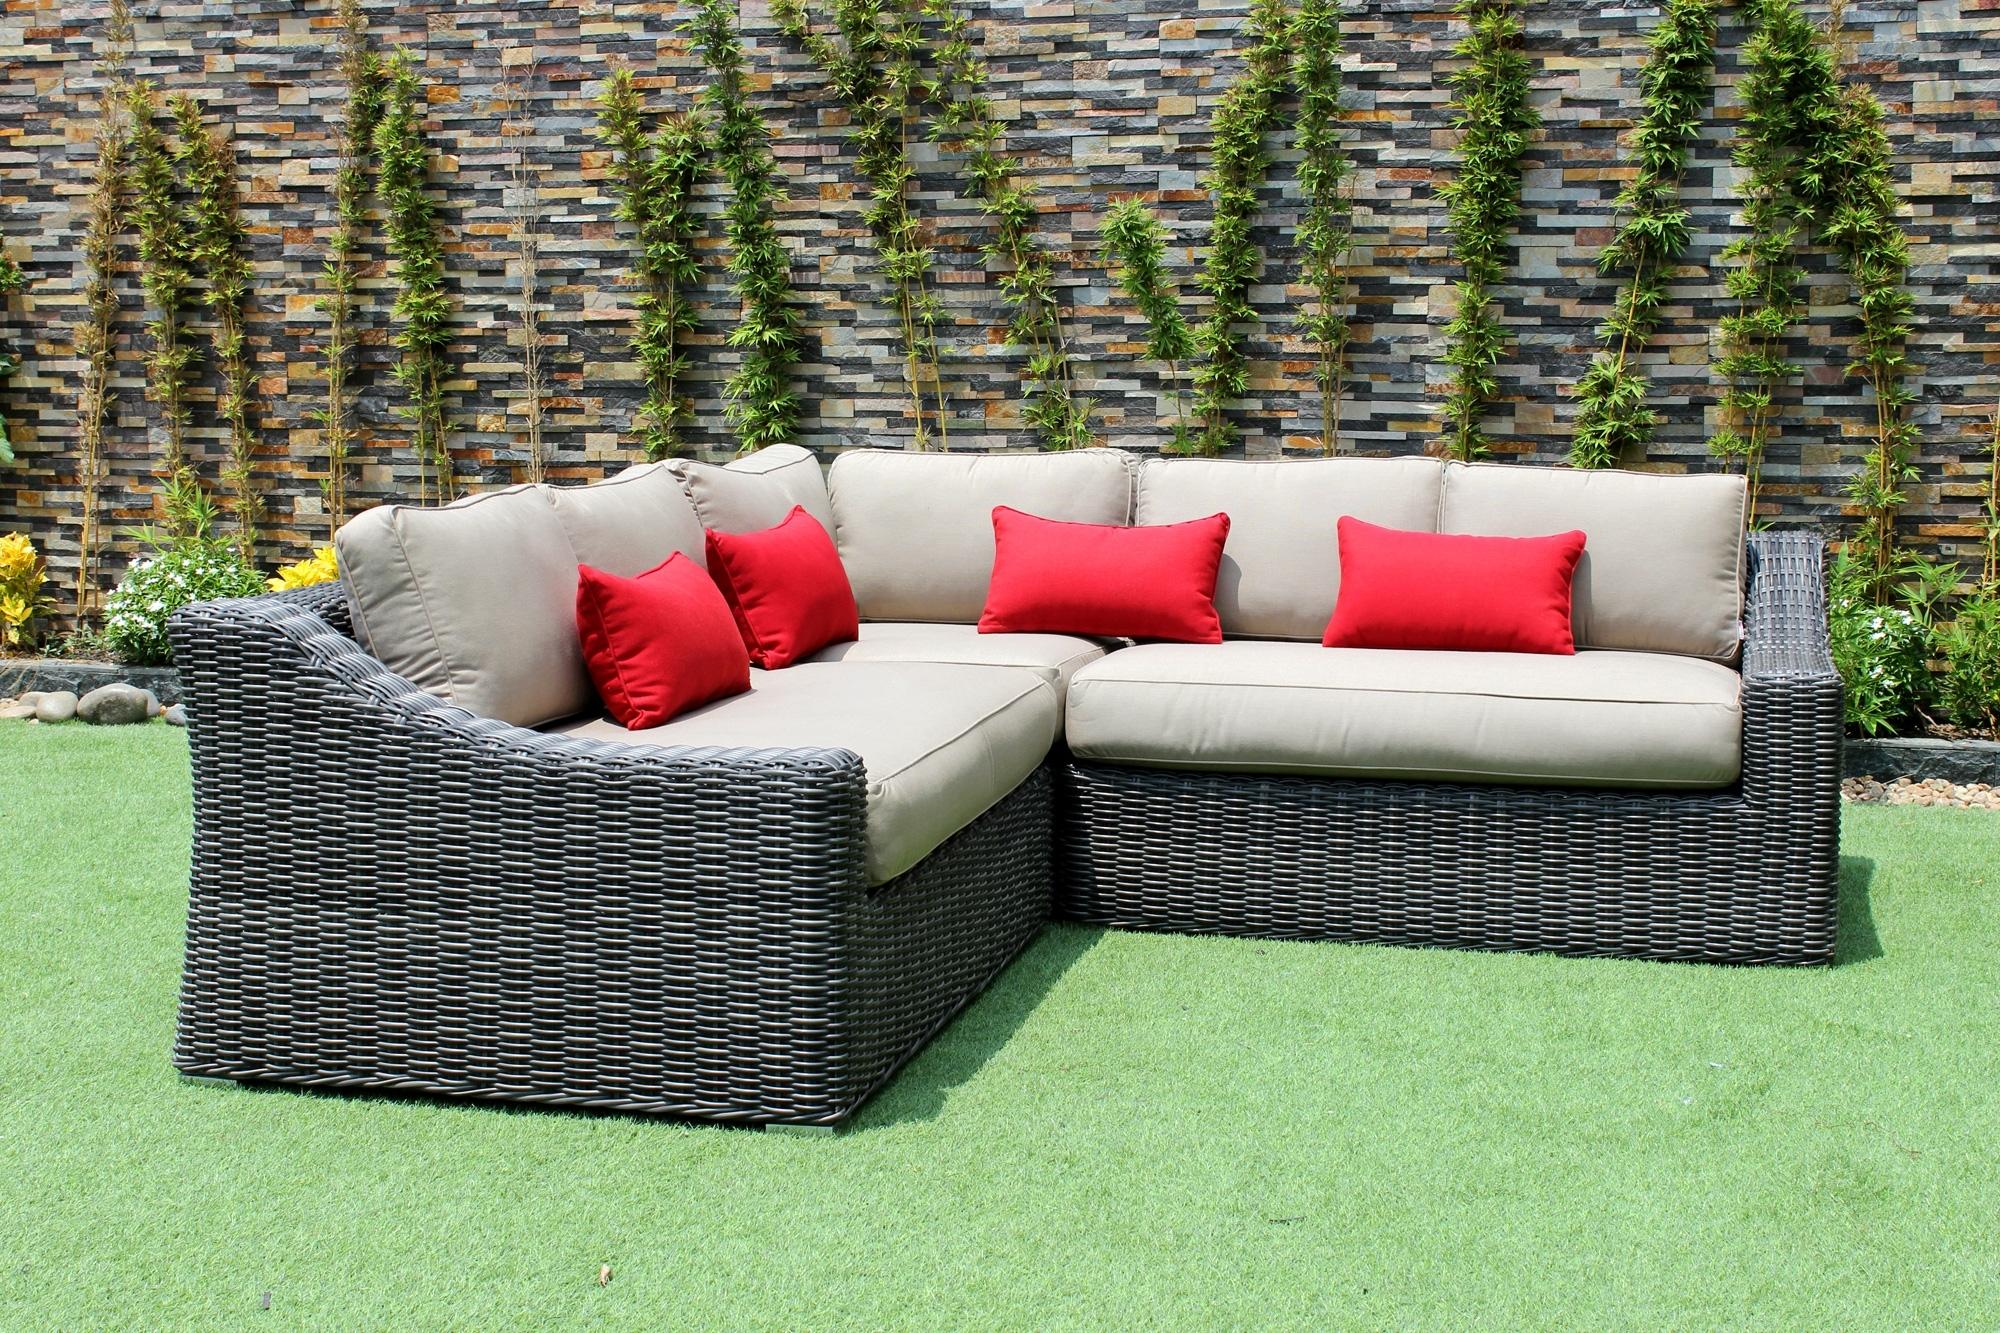 Fashionable Nanaimo Sectional Sofas Inside Marseille Outdoor Patio Wicker Sunbrella Corner Sectional Sofa (View 14 of 15)